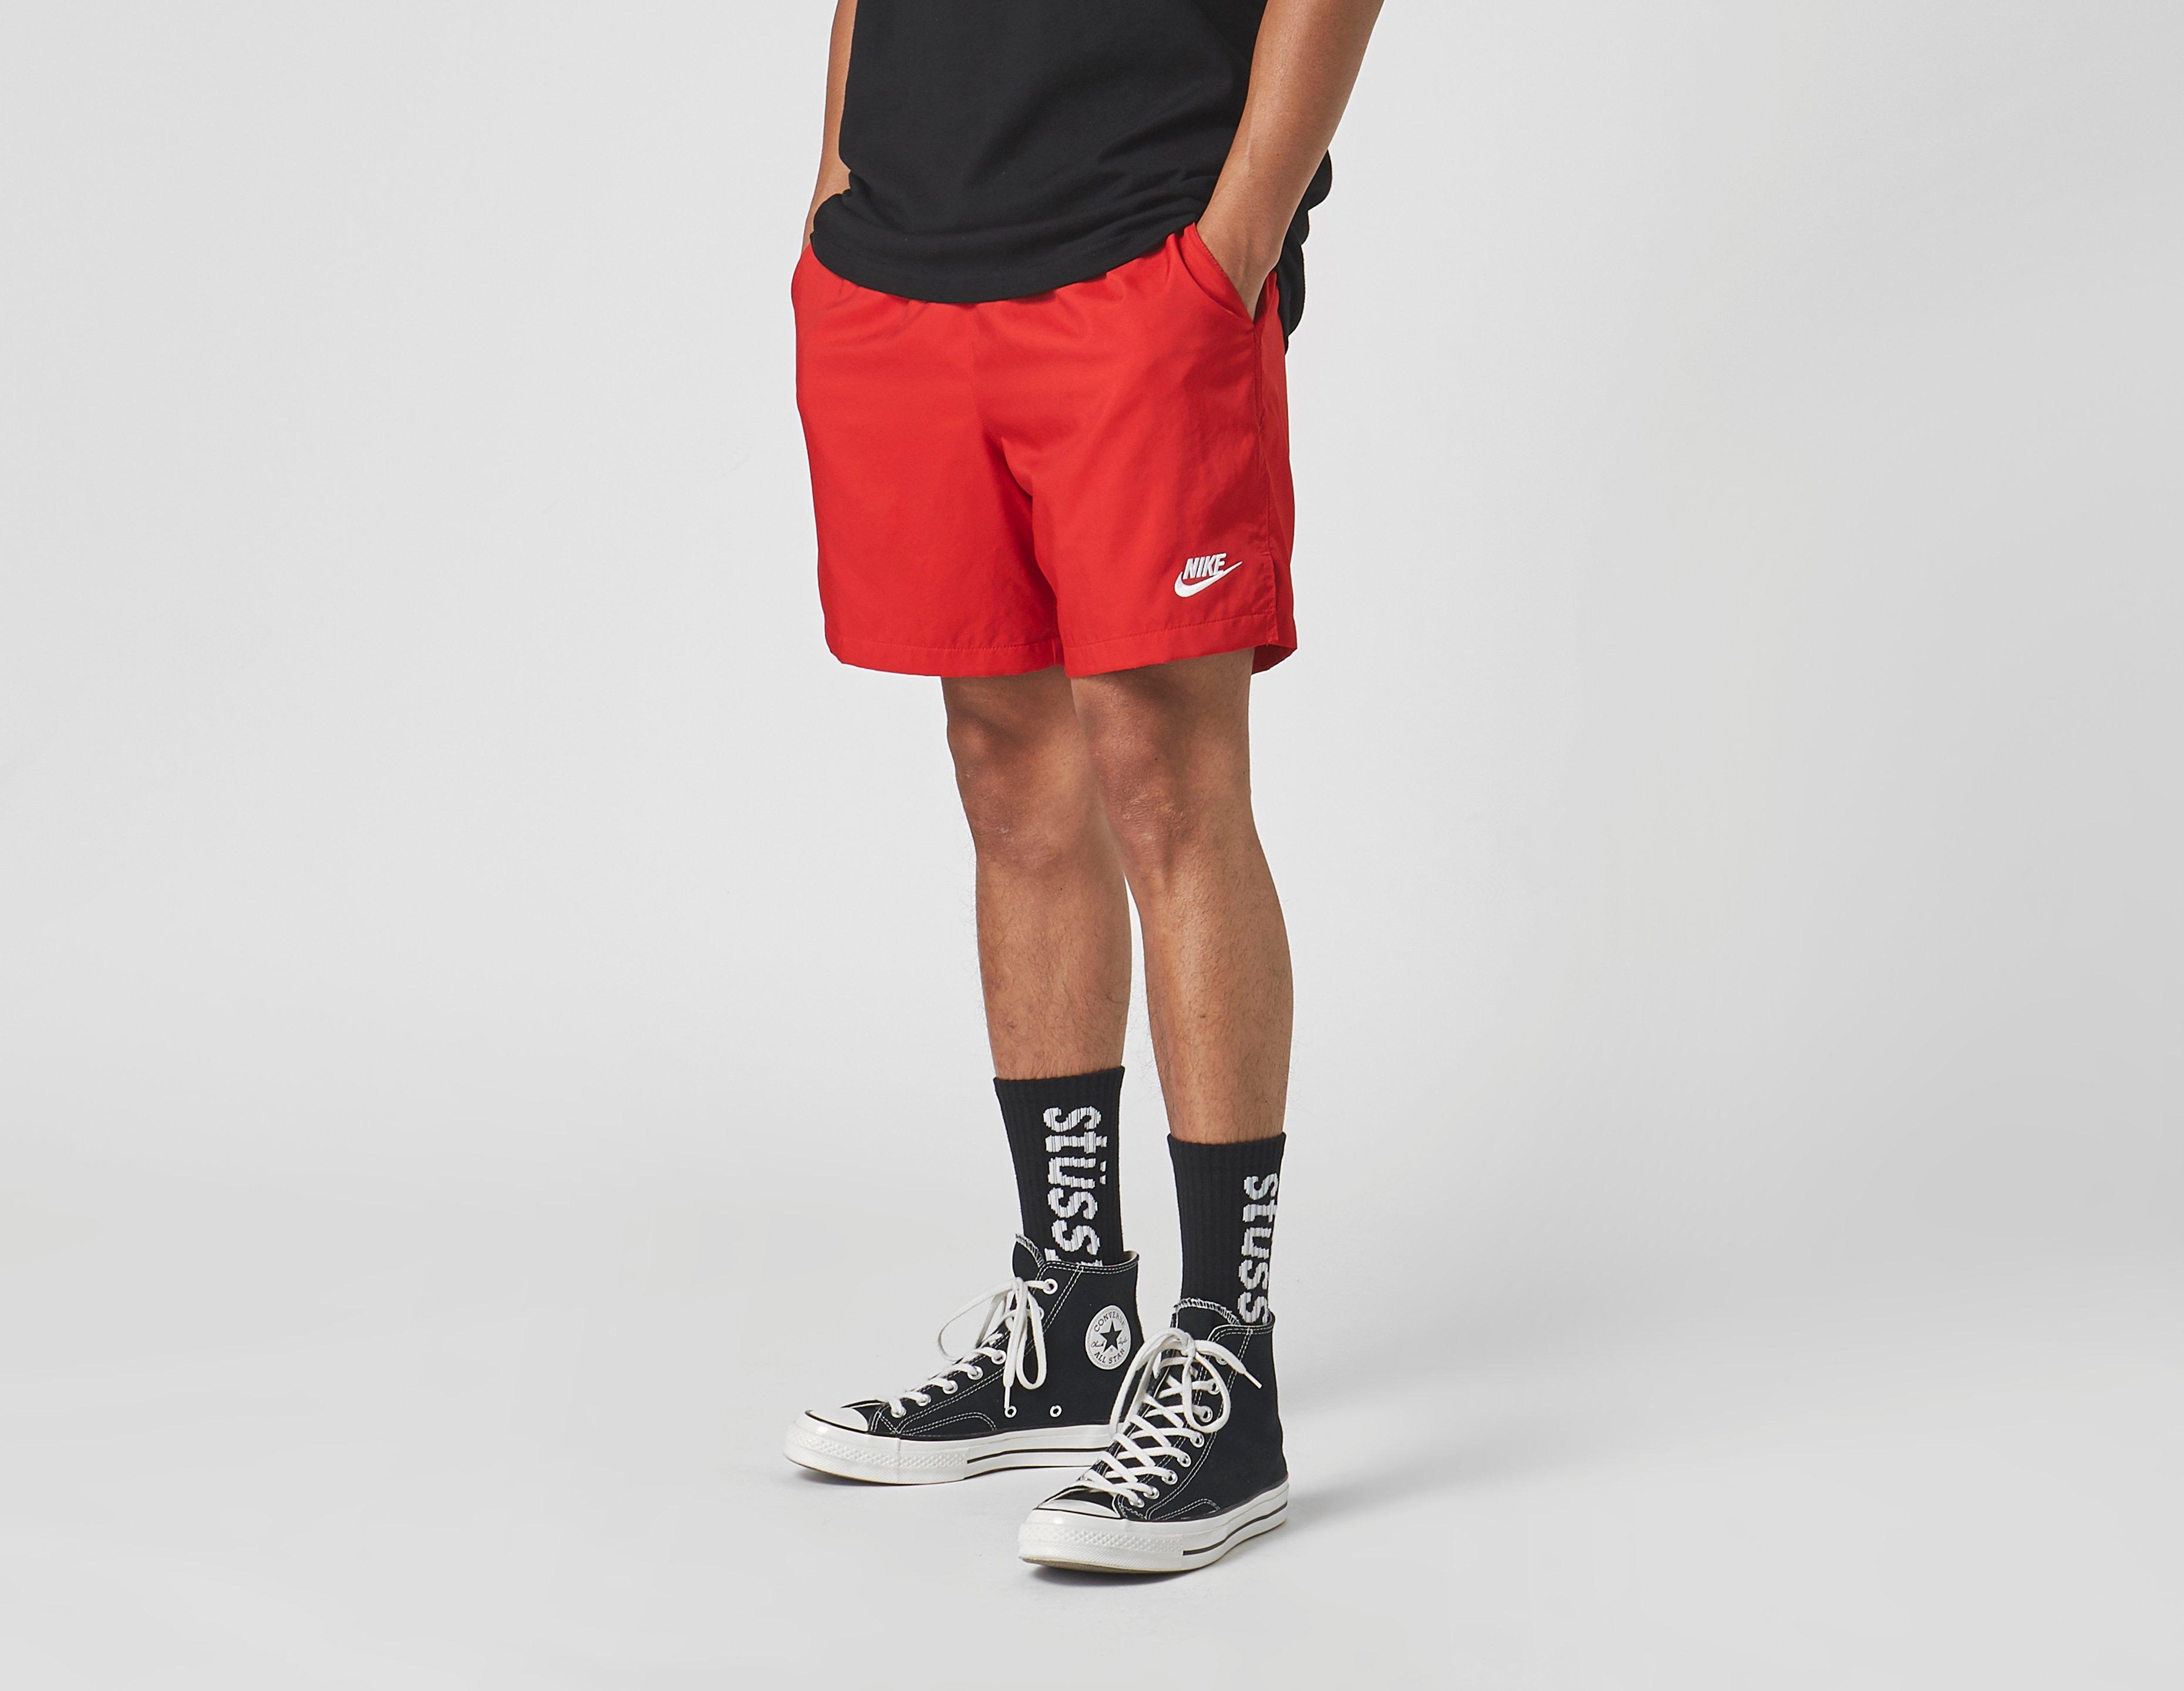 Nike Short Flow | Size?